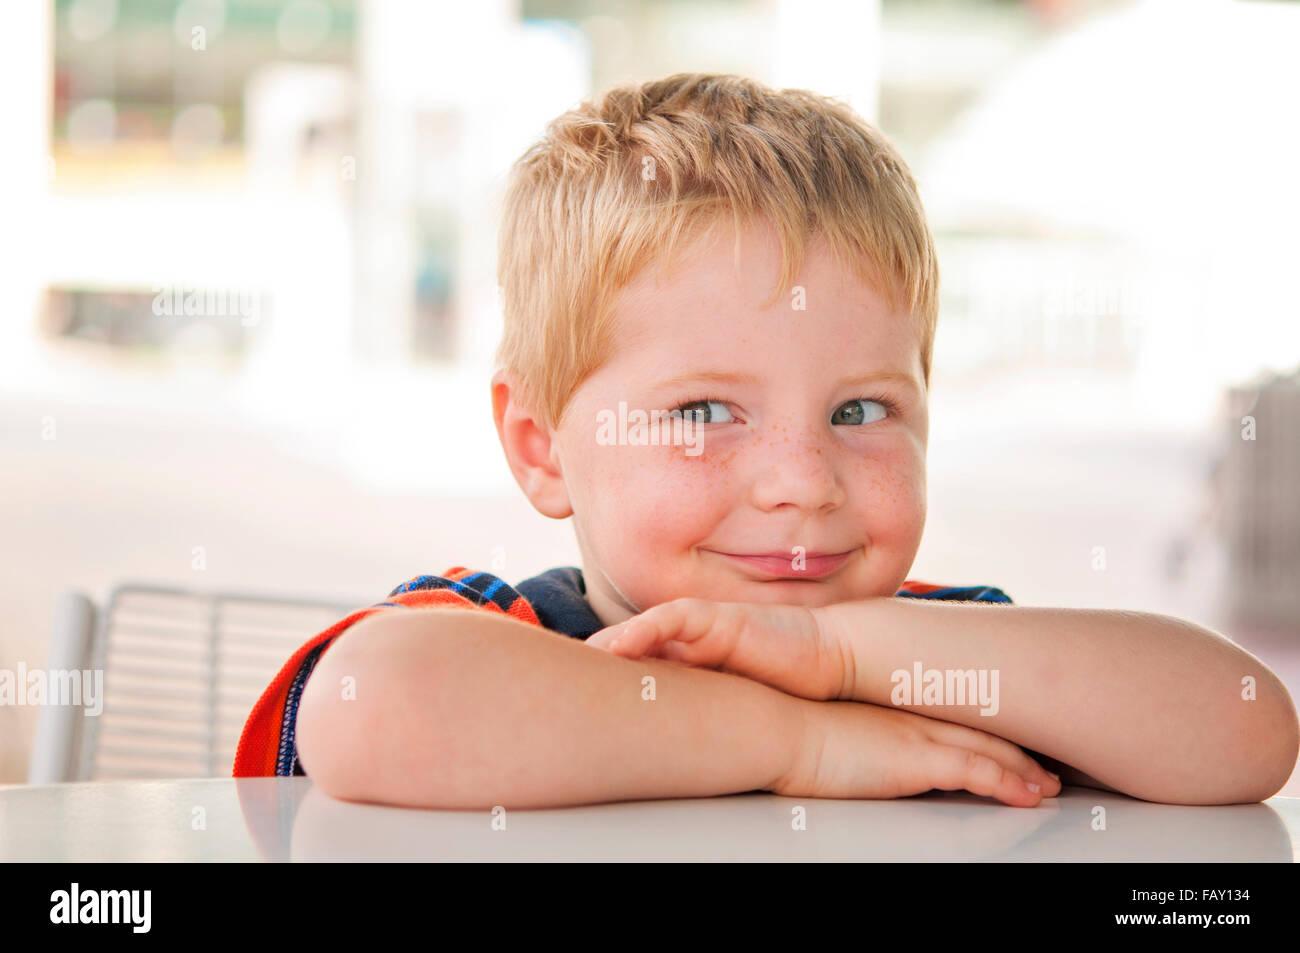 Mischievous smiling boy - Stock Image